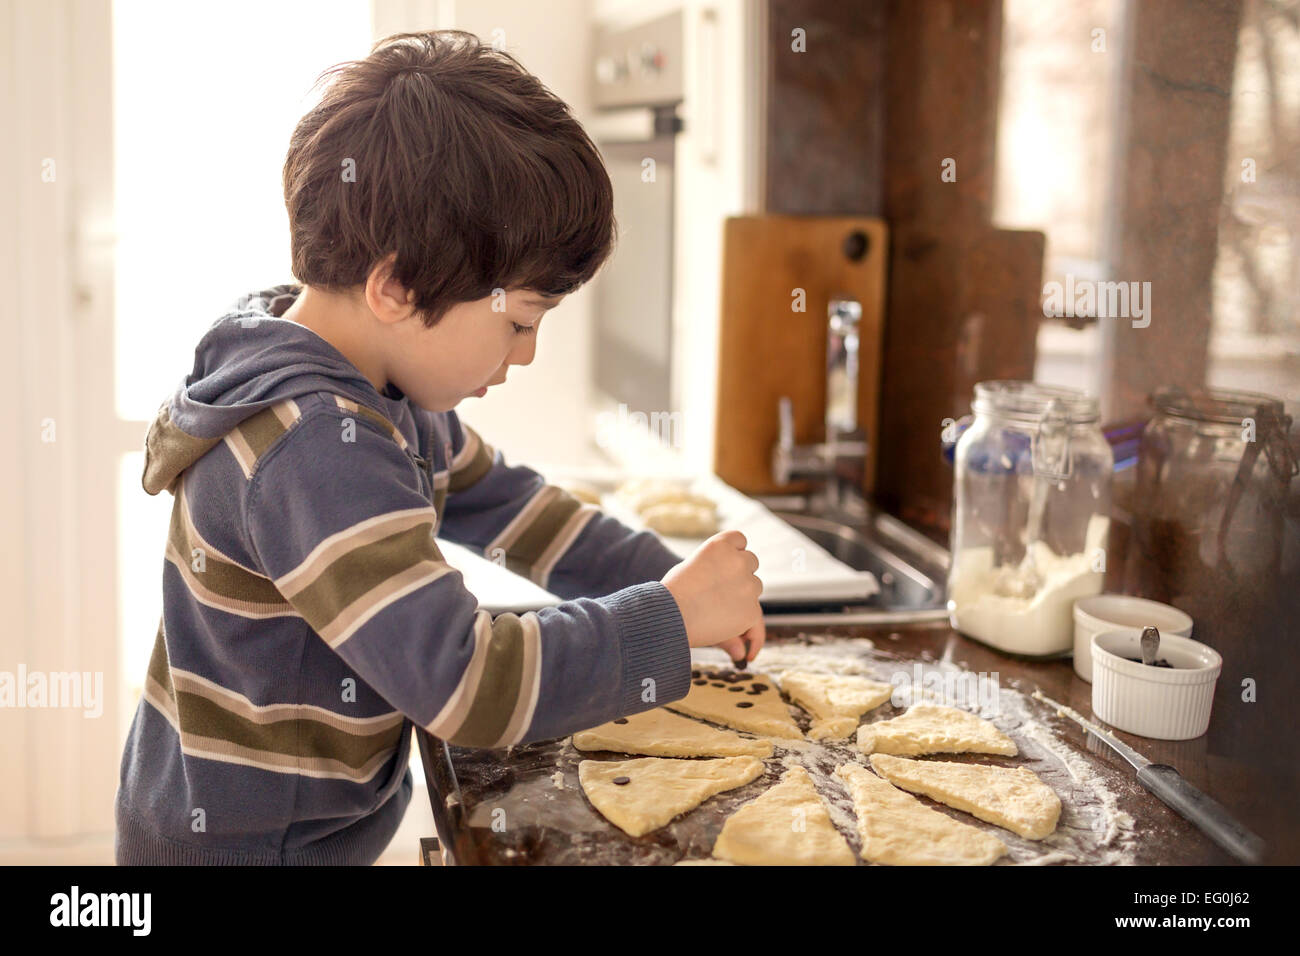 Boy (4-5) preparing meal - Stock Image